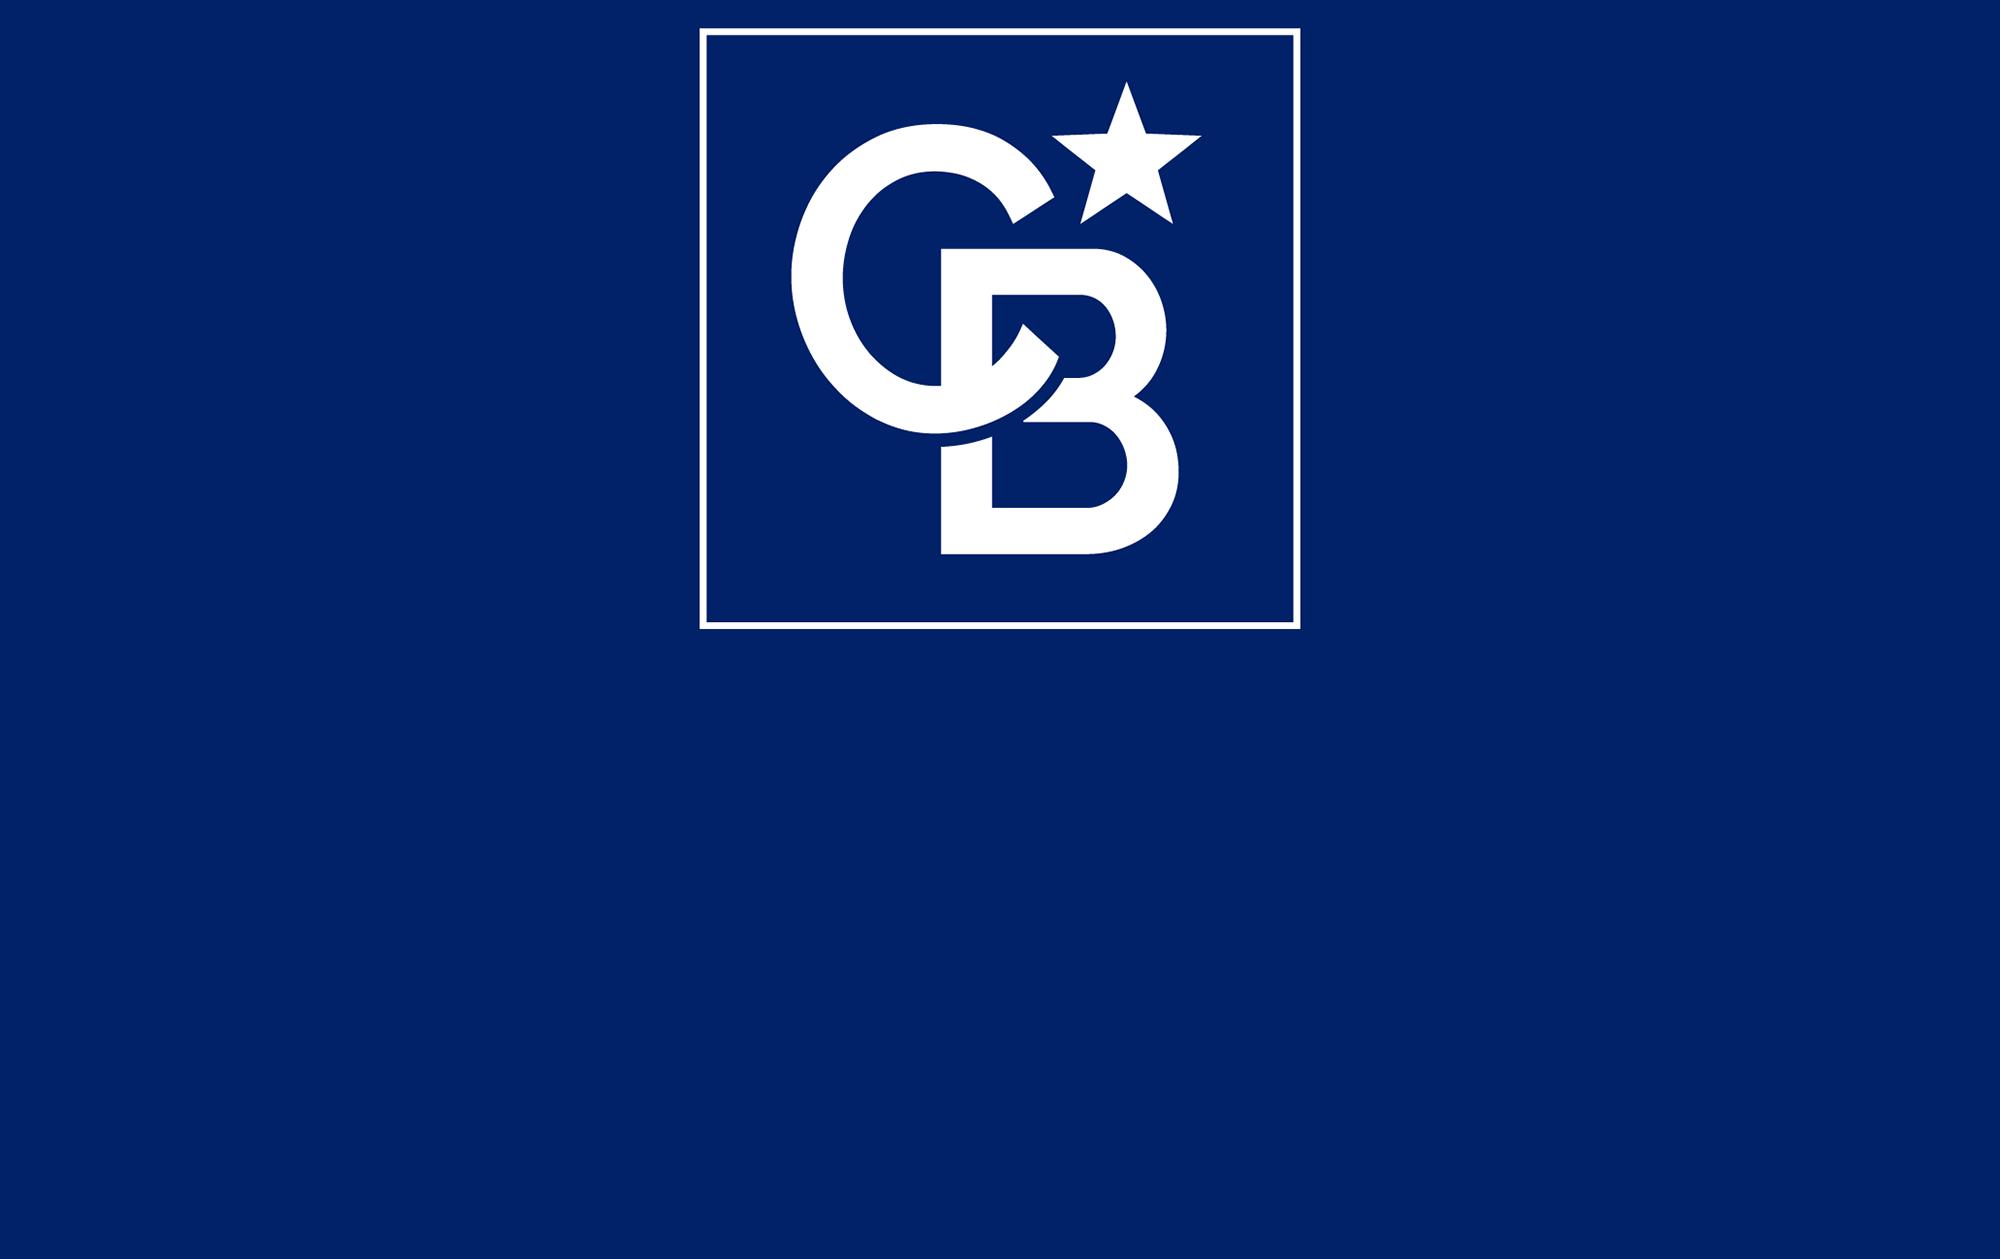 cbhb04 Logo